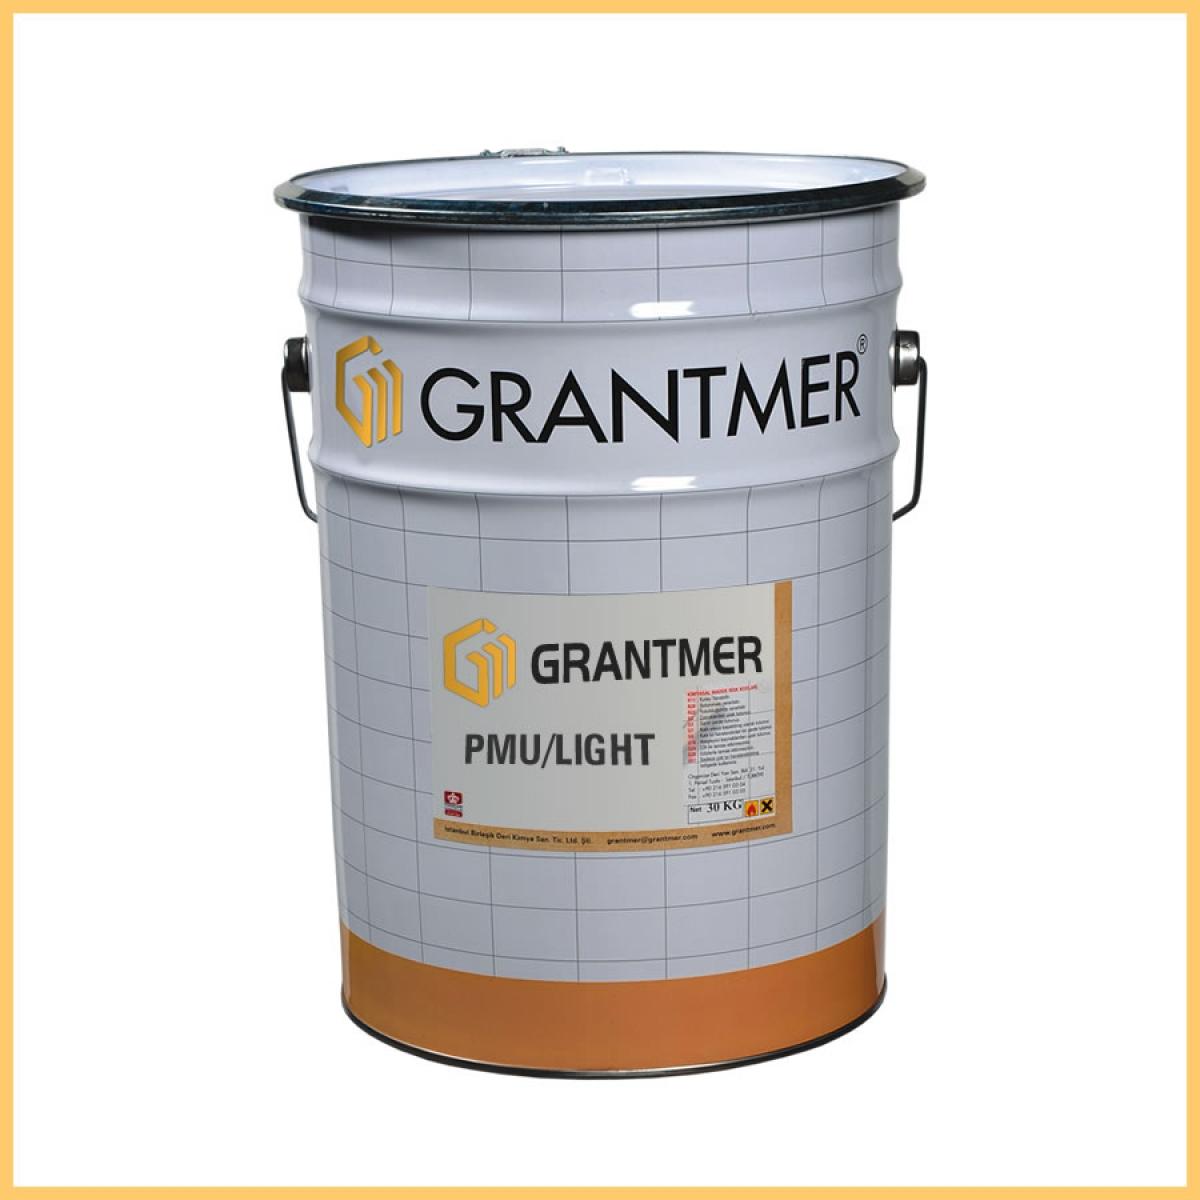 GRANTMER PMU/LIGHT